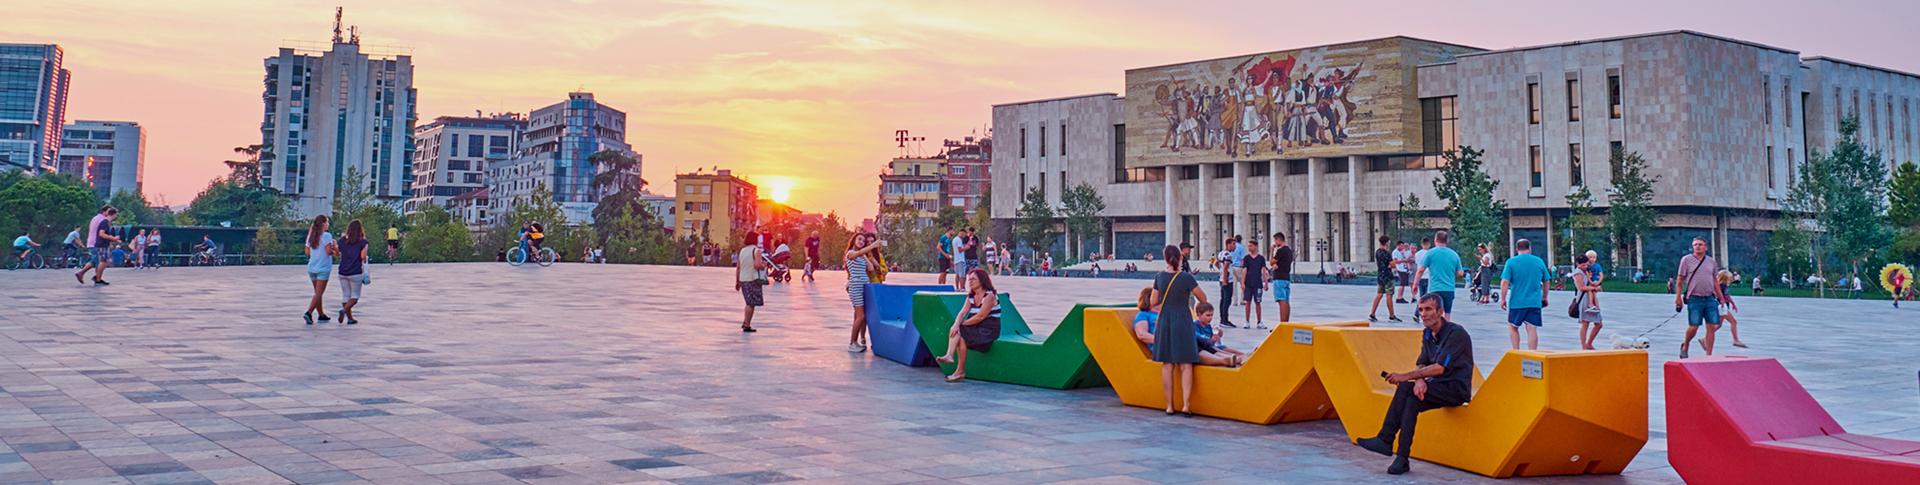 Place skanderbeg_mini circuit Albanie 3 jours